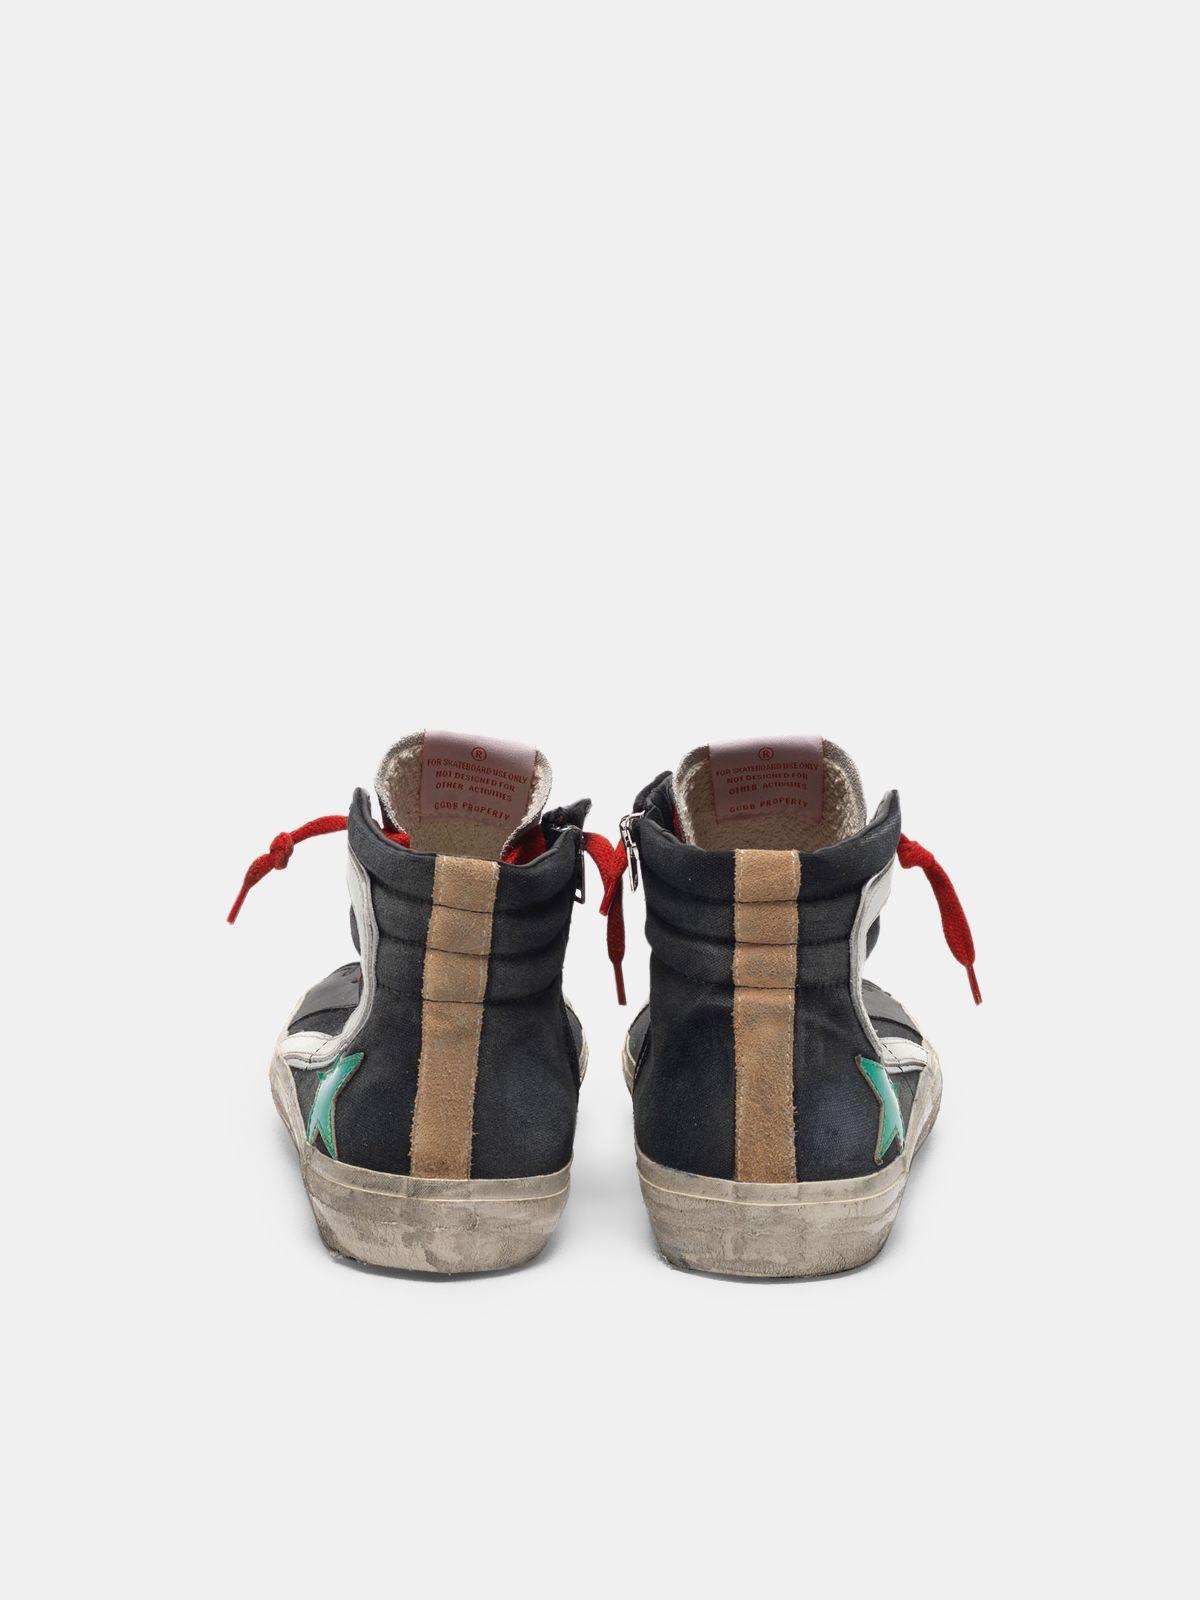 Golden Goose - Black Slide sneakers in canvas with metallic green star in